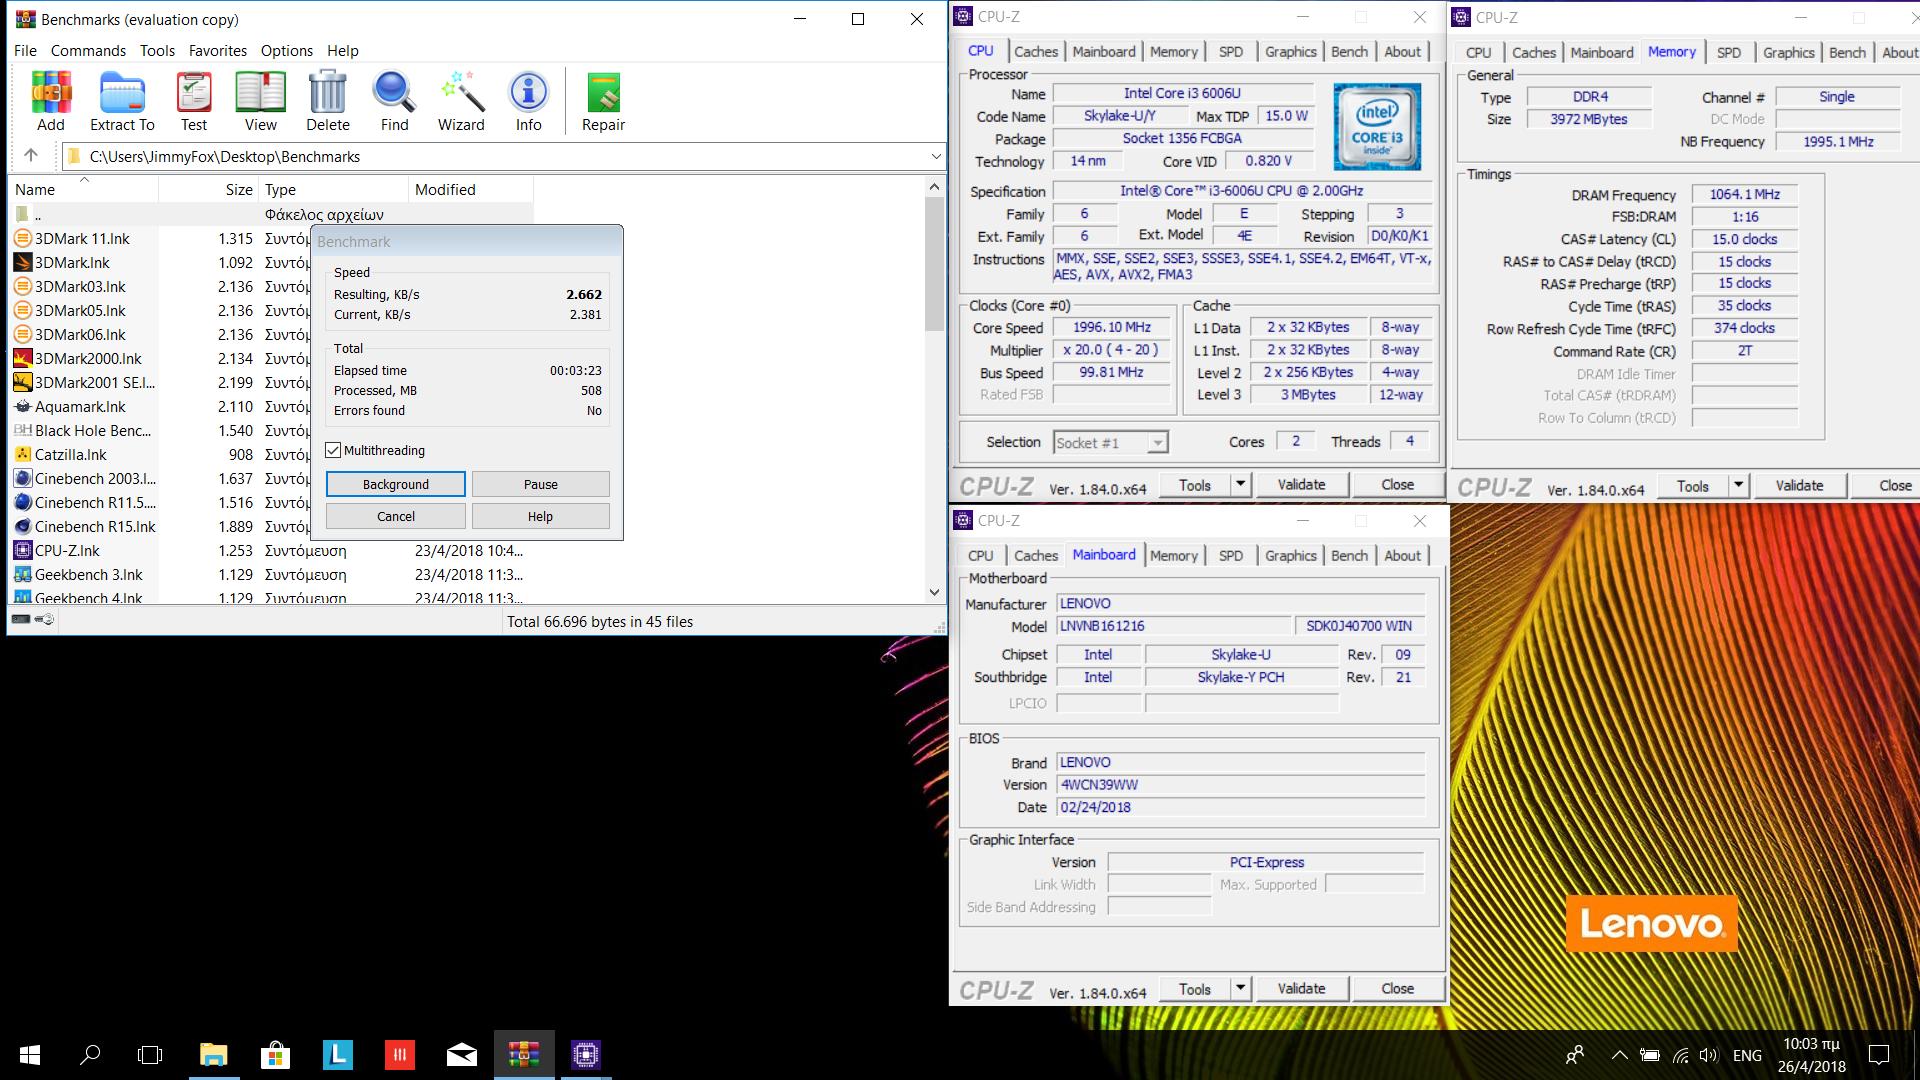 Ilias83`s WinRAR score: 2662 KB/s with a Core i3 6006U